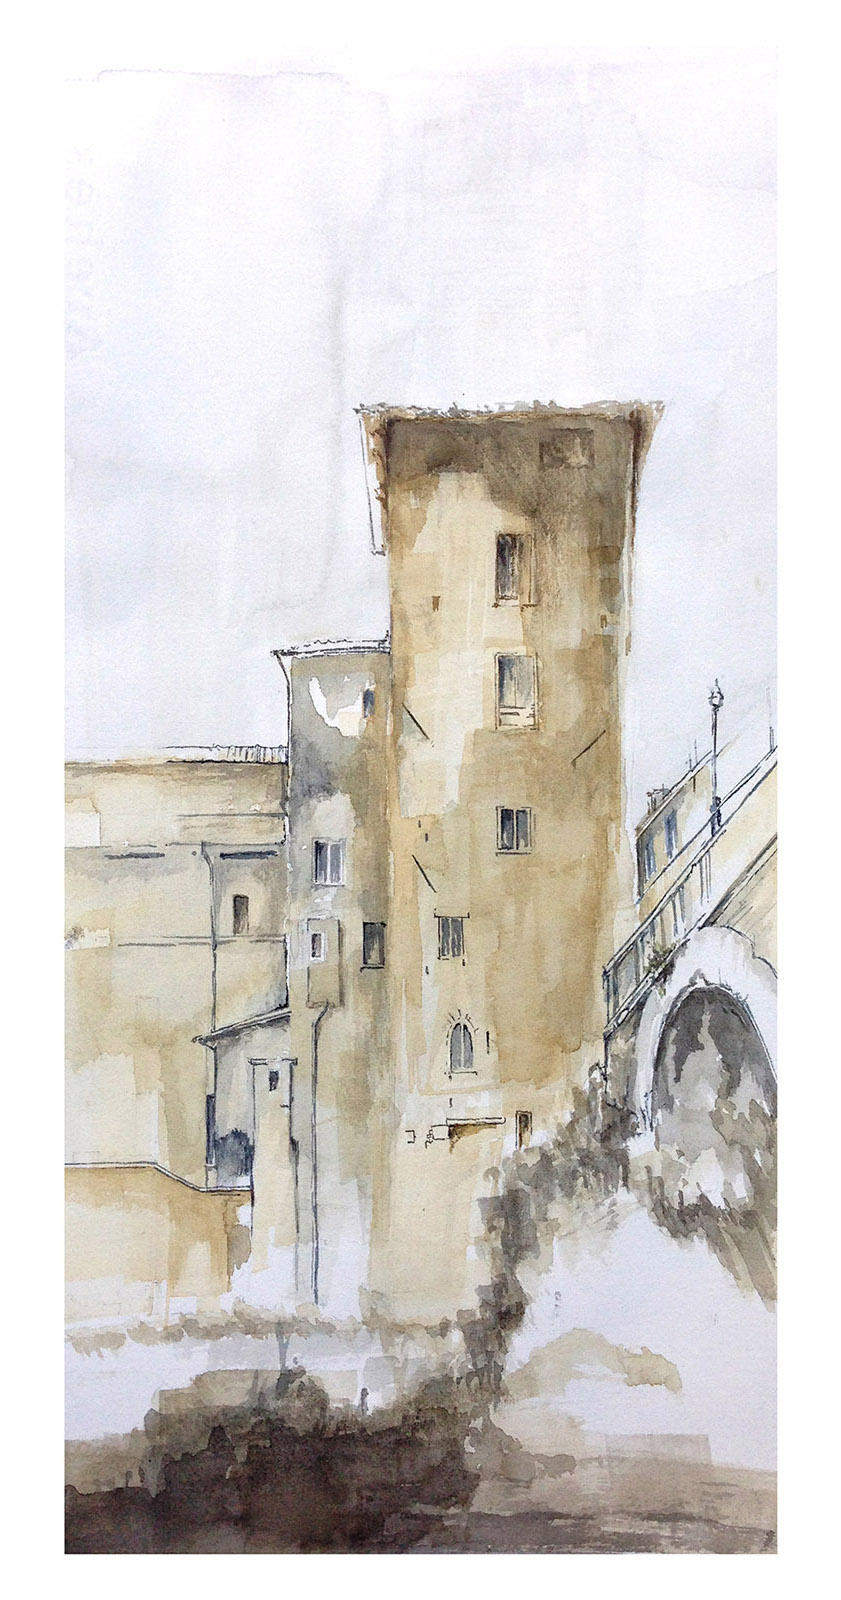 Torre isola Tiberina_Roma_Lungotevere_ateliercrilo.com.jpg